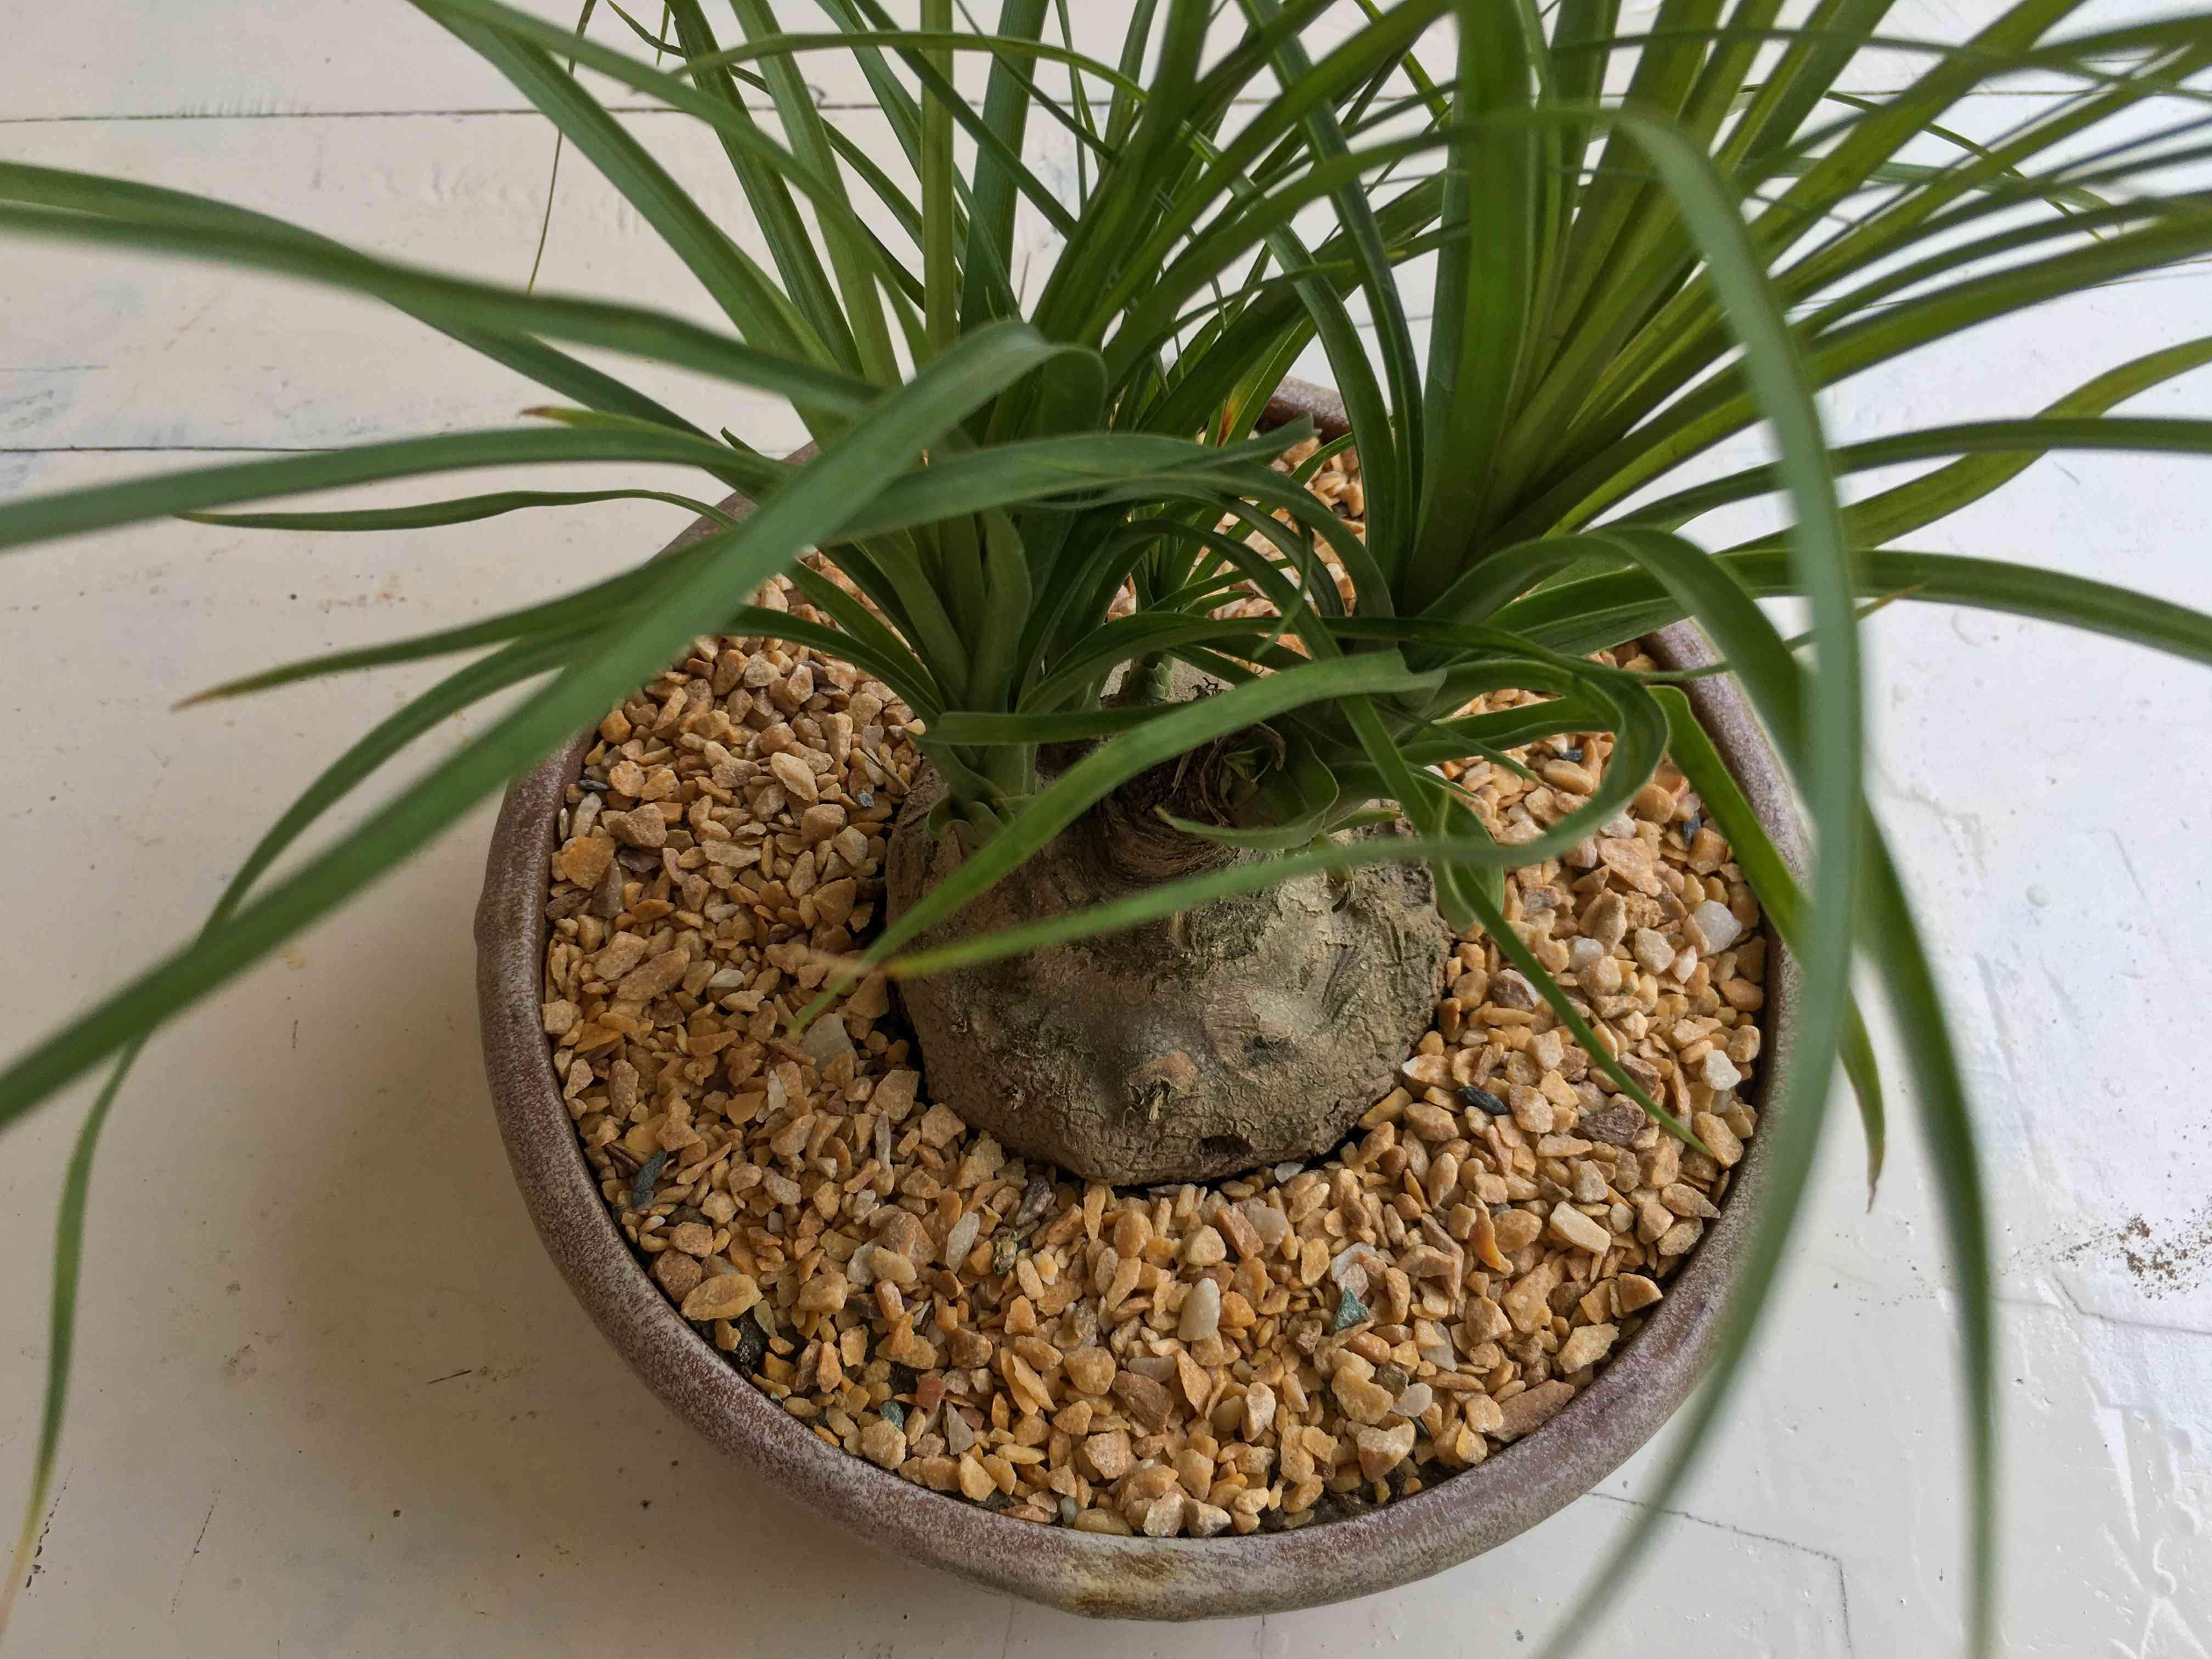 Small Beaucarnea ponytail palm closeup view